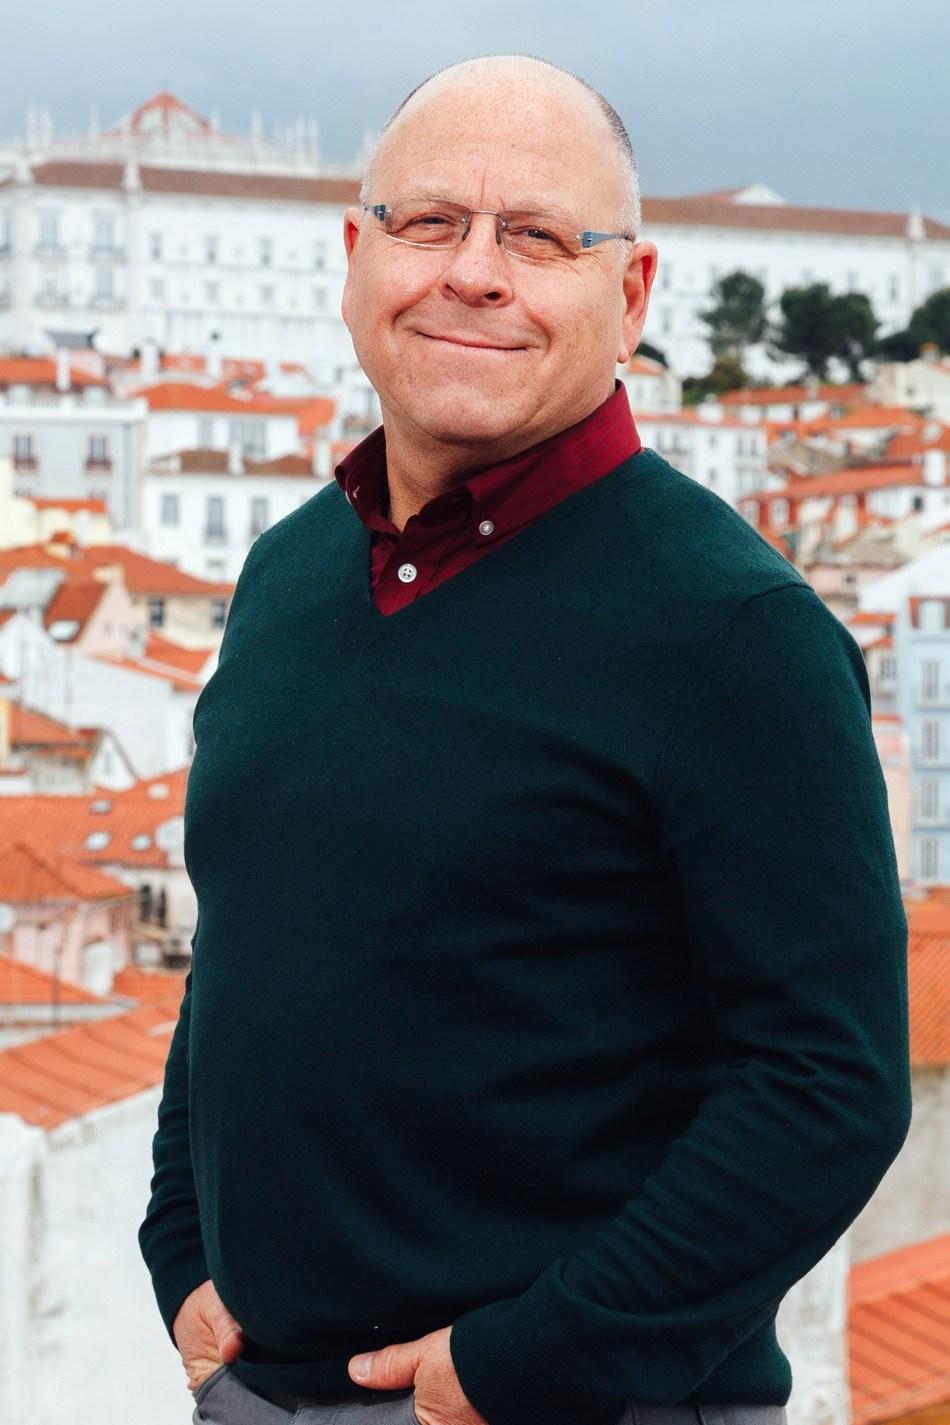 Yuval Brisker, cofounder and CEO of Mezu